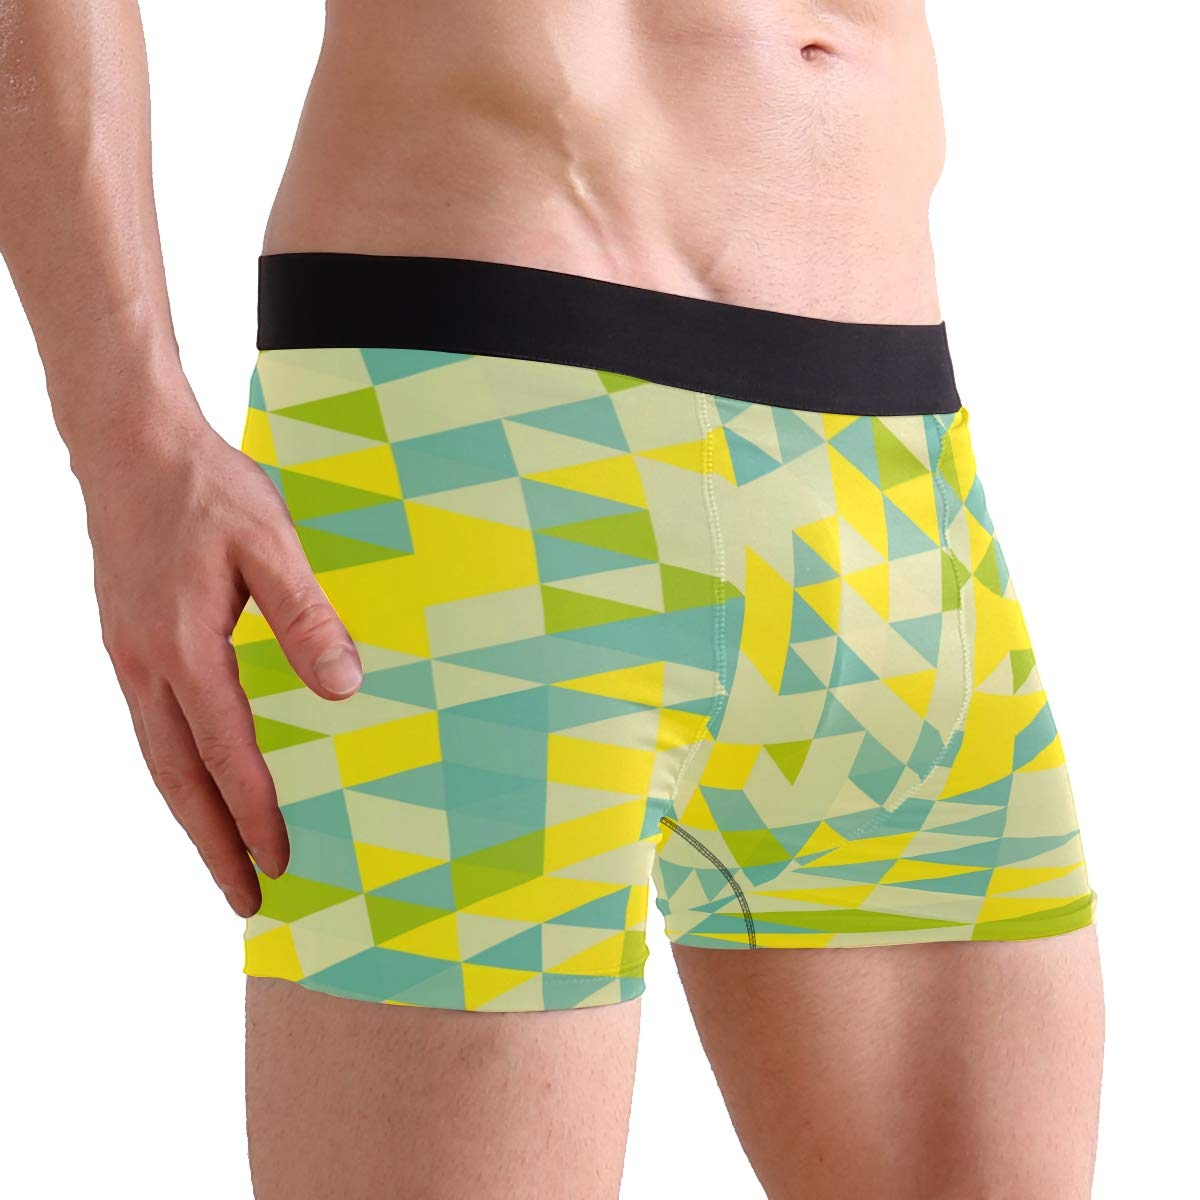 FAJRO Blue Green Triangle Figure Mens Regular Leg Boxer Brief Underwear